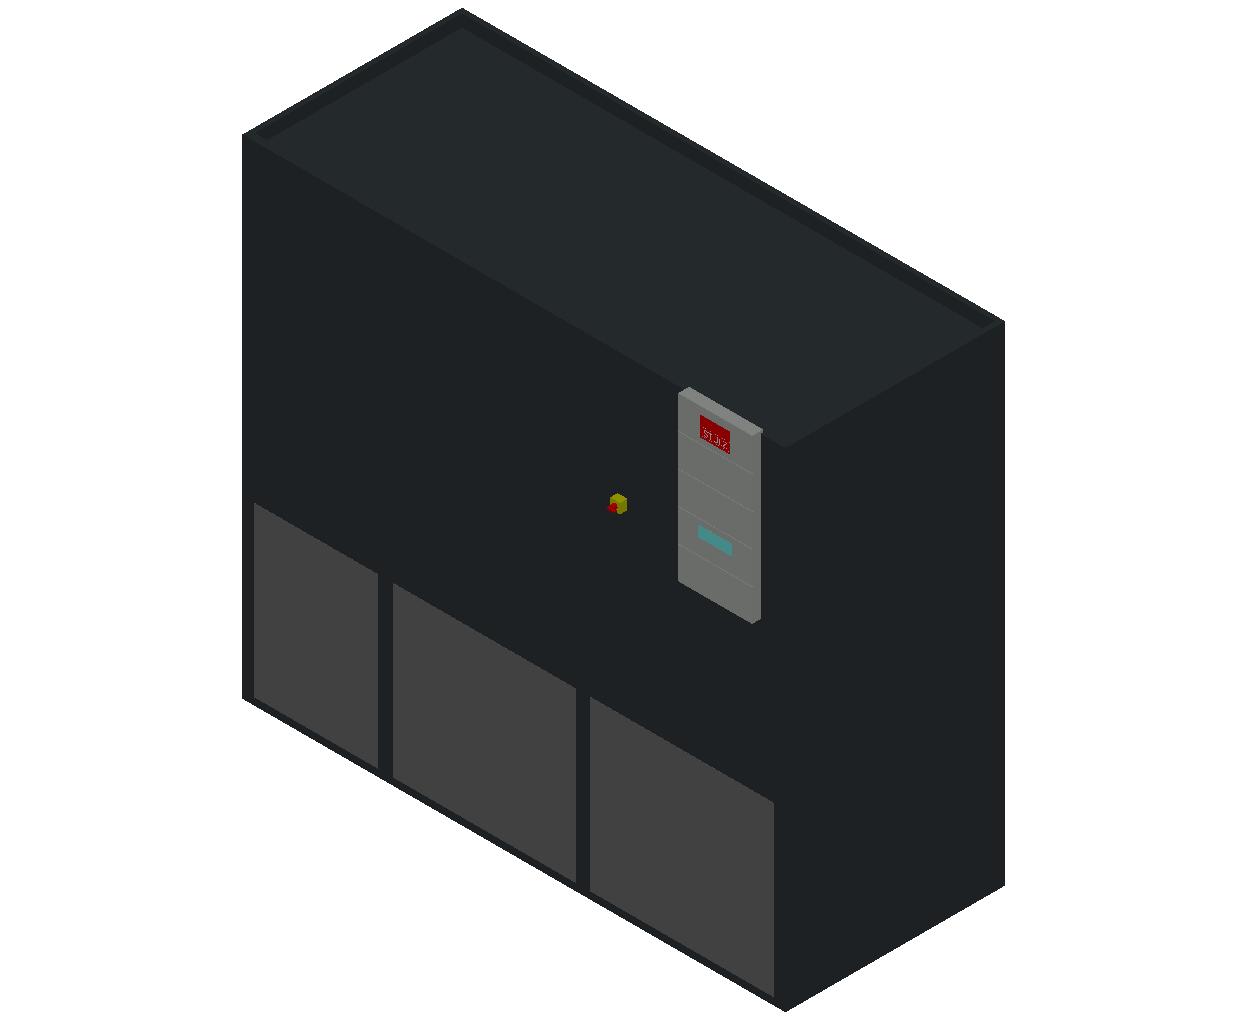 HC_Air Conditioner_Indoor Unit_MEPcontent_STULZ_CyberAir 3PRO_ALU_Dual Circuit GES_ALU_692_GES_INT-EN.dwg